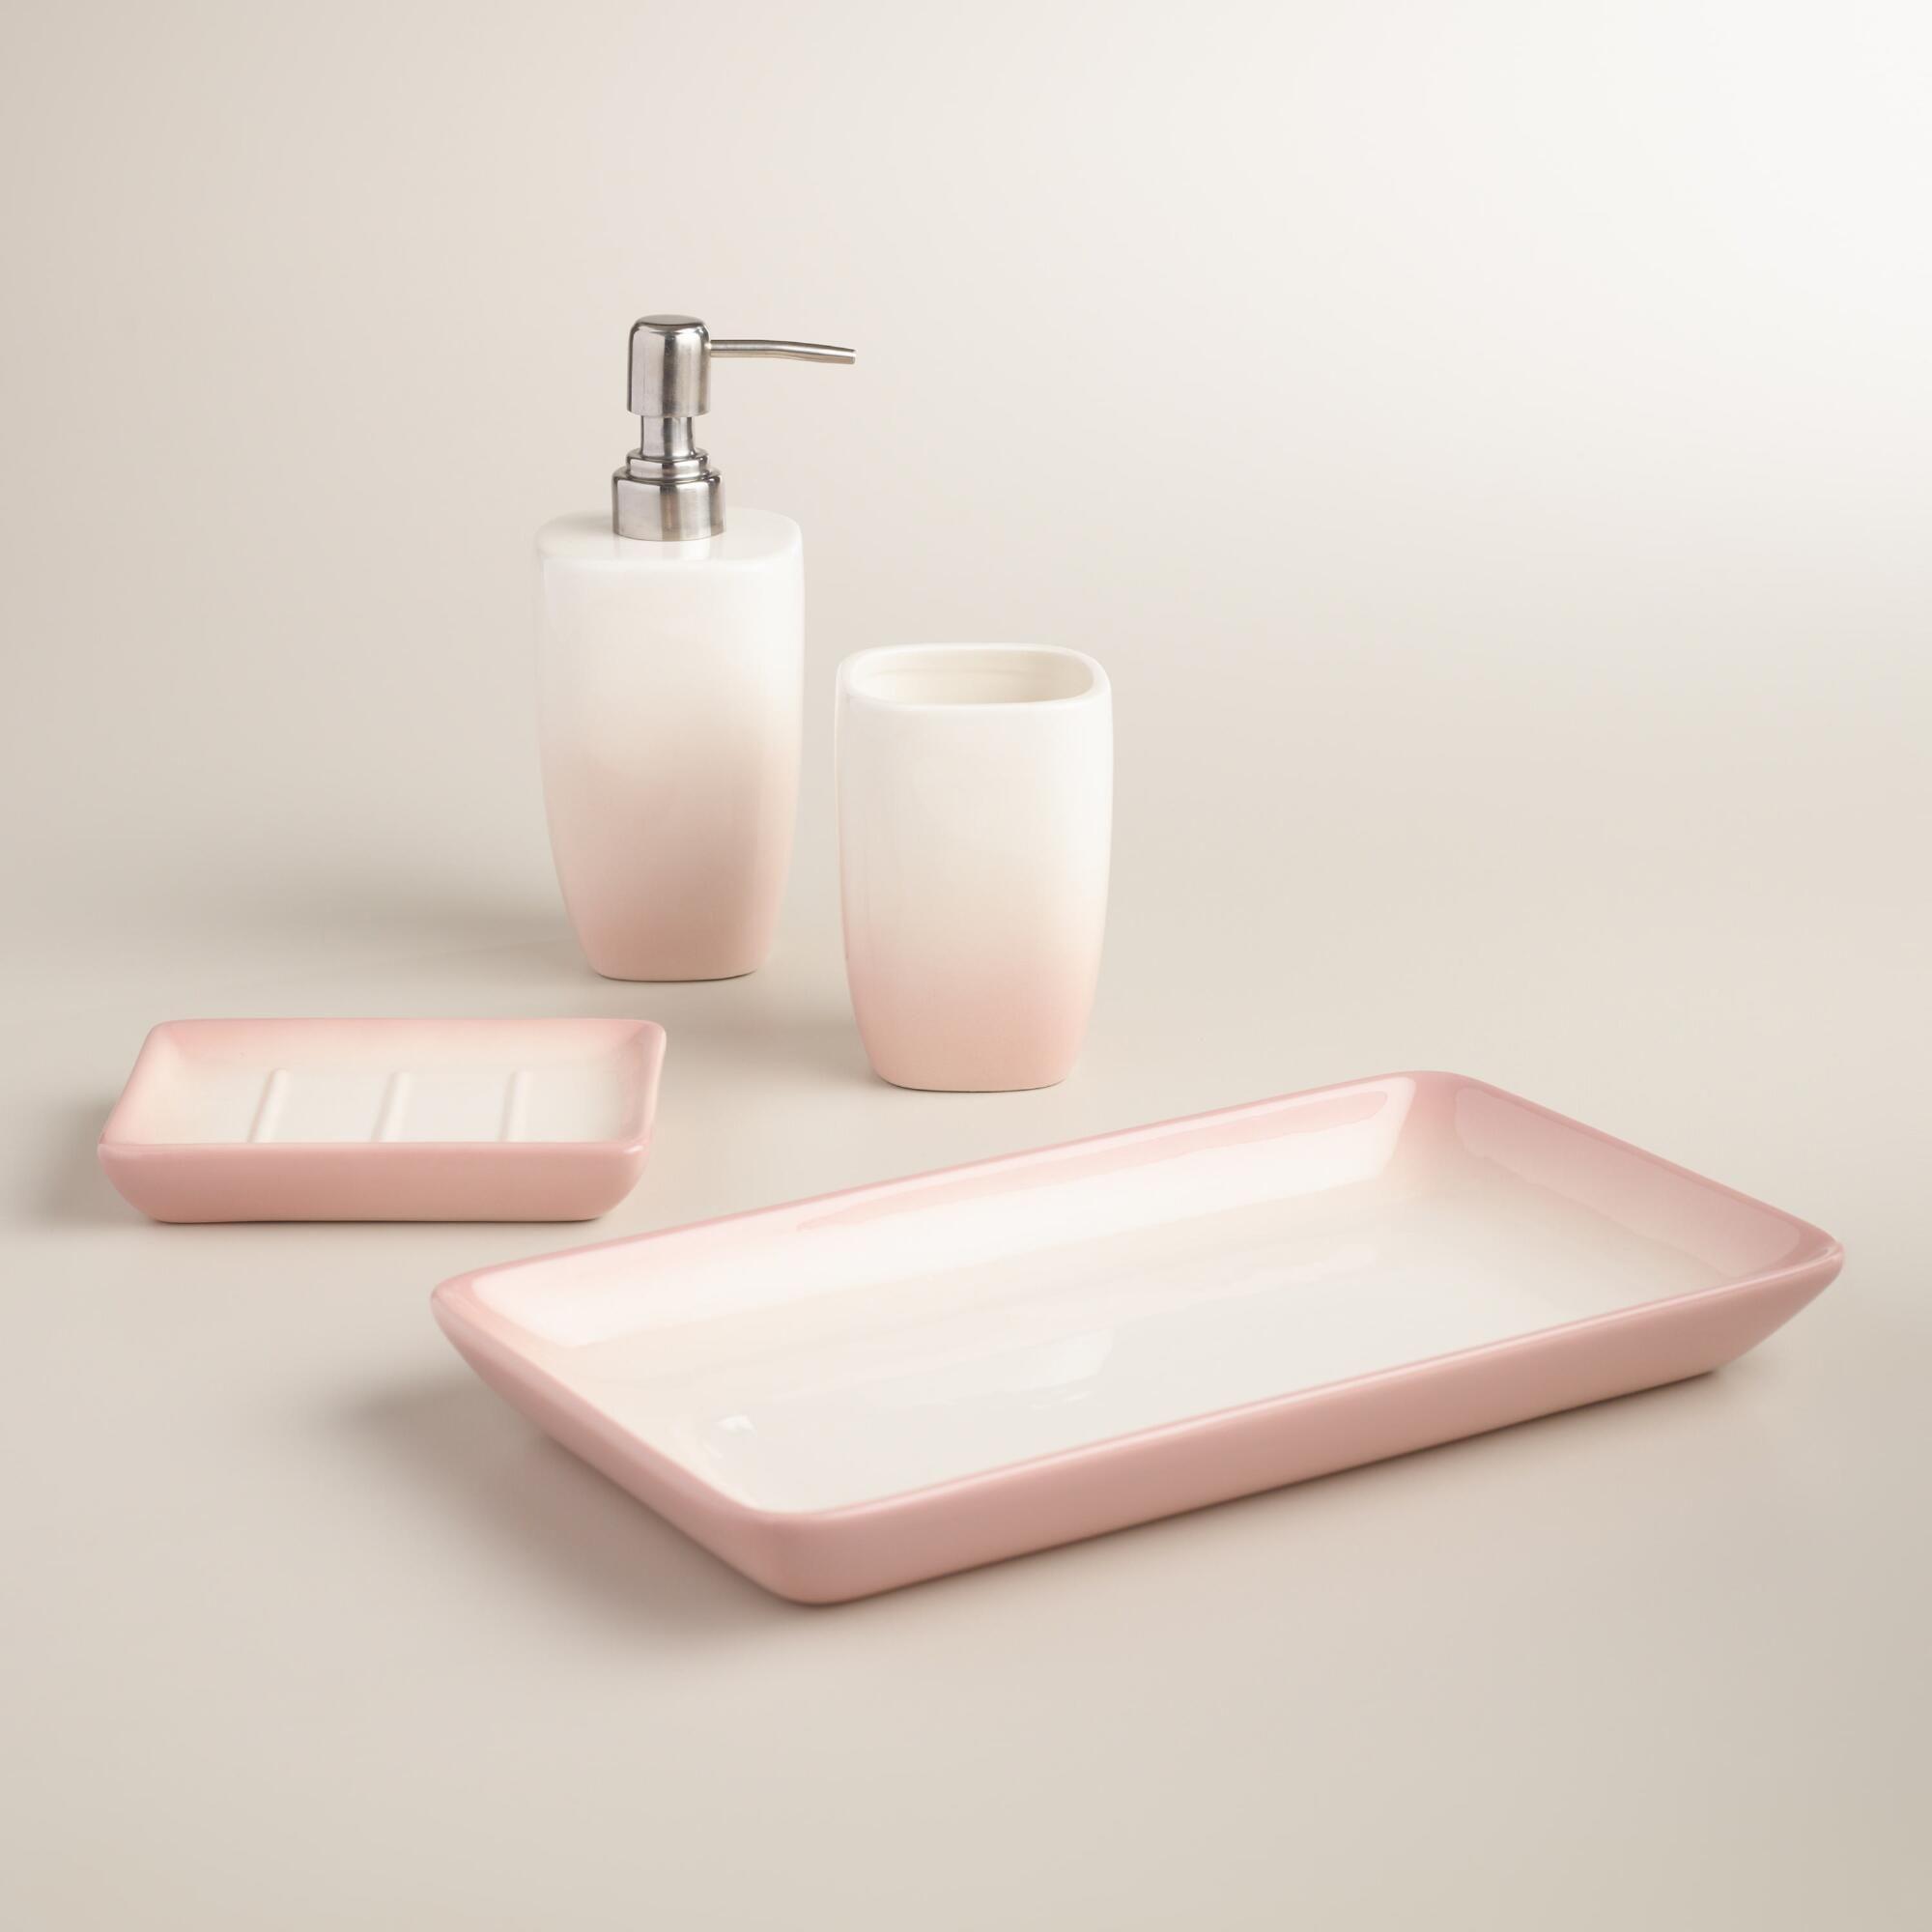 Blush Ombre Ceramic Bath Accessories Collection Pink Bathroom